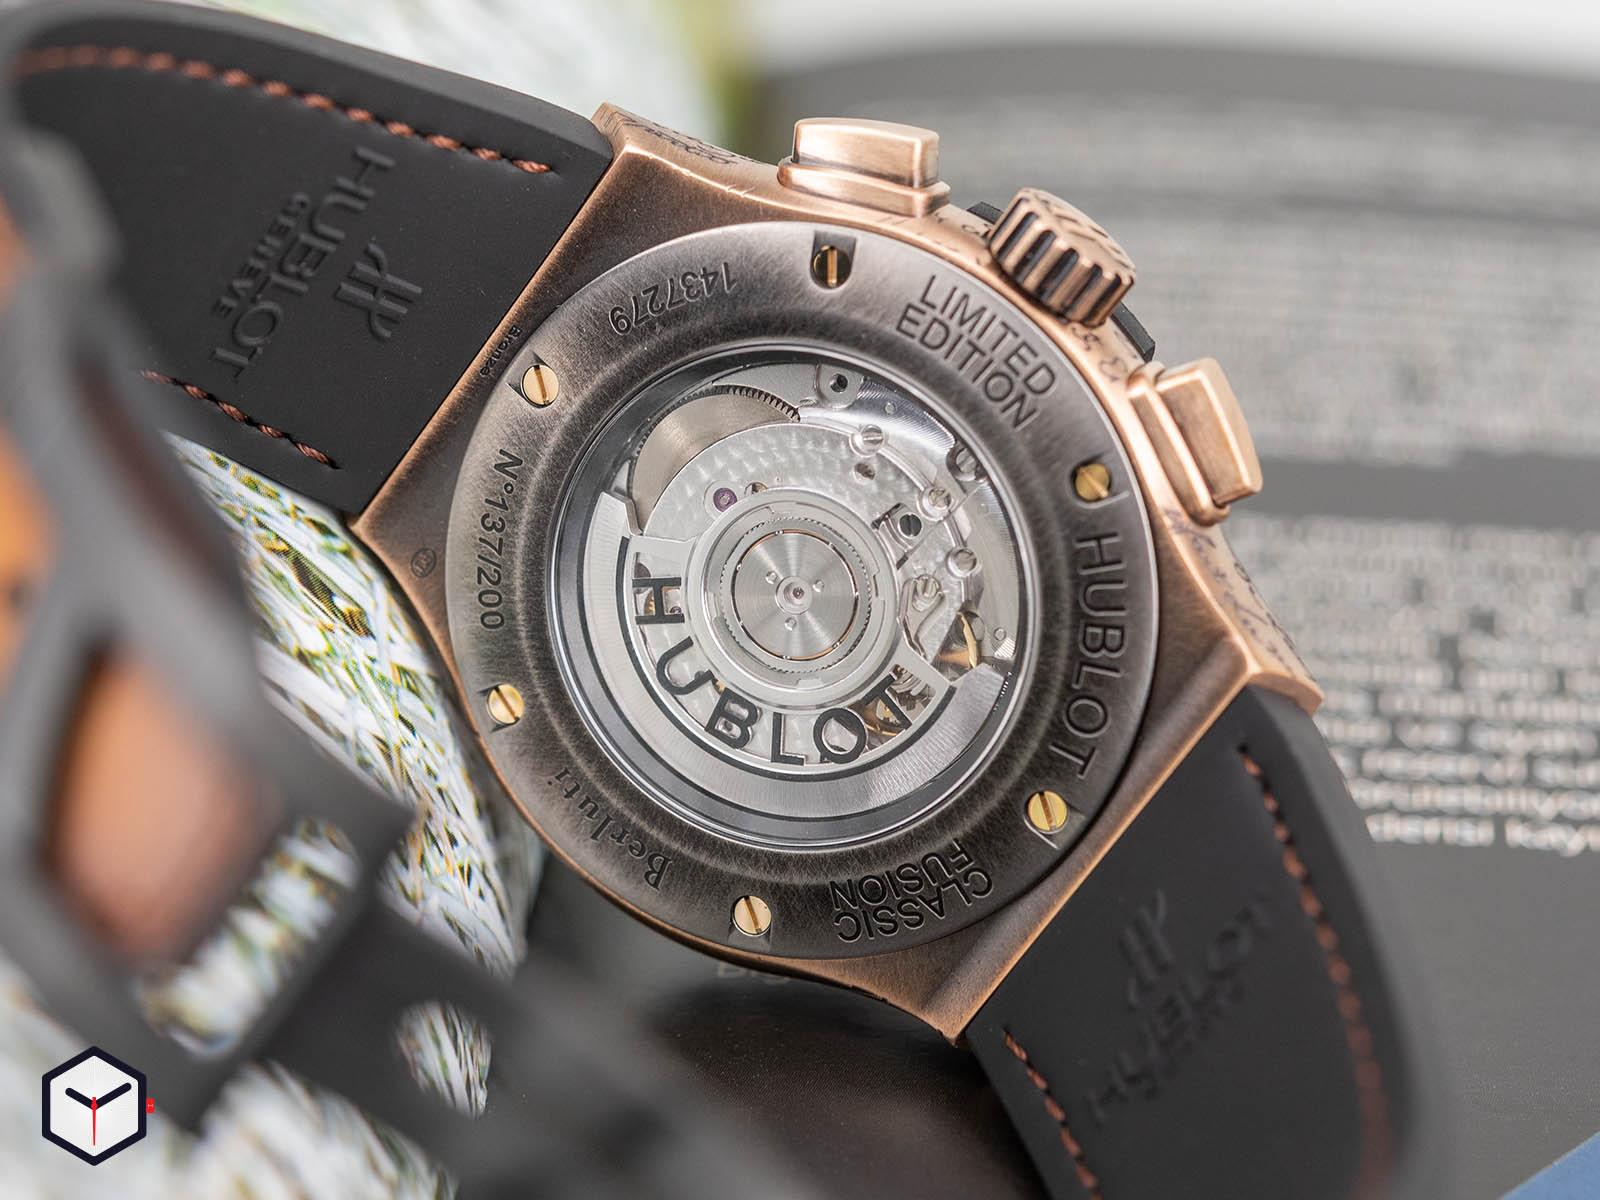 521-bz-05ig-vr-ber19-hublot-classic-fusion-chronograph-berluti-cold-gold-6.jpg